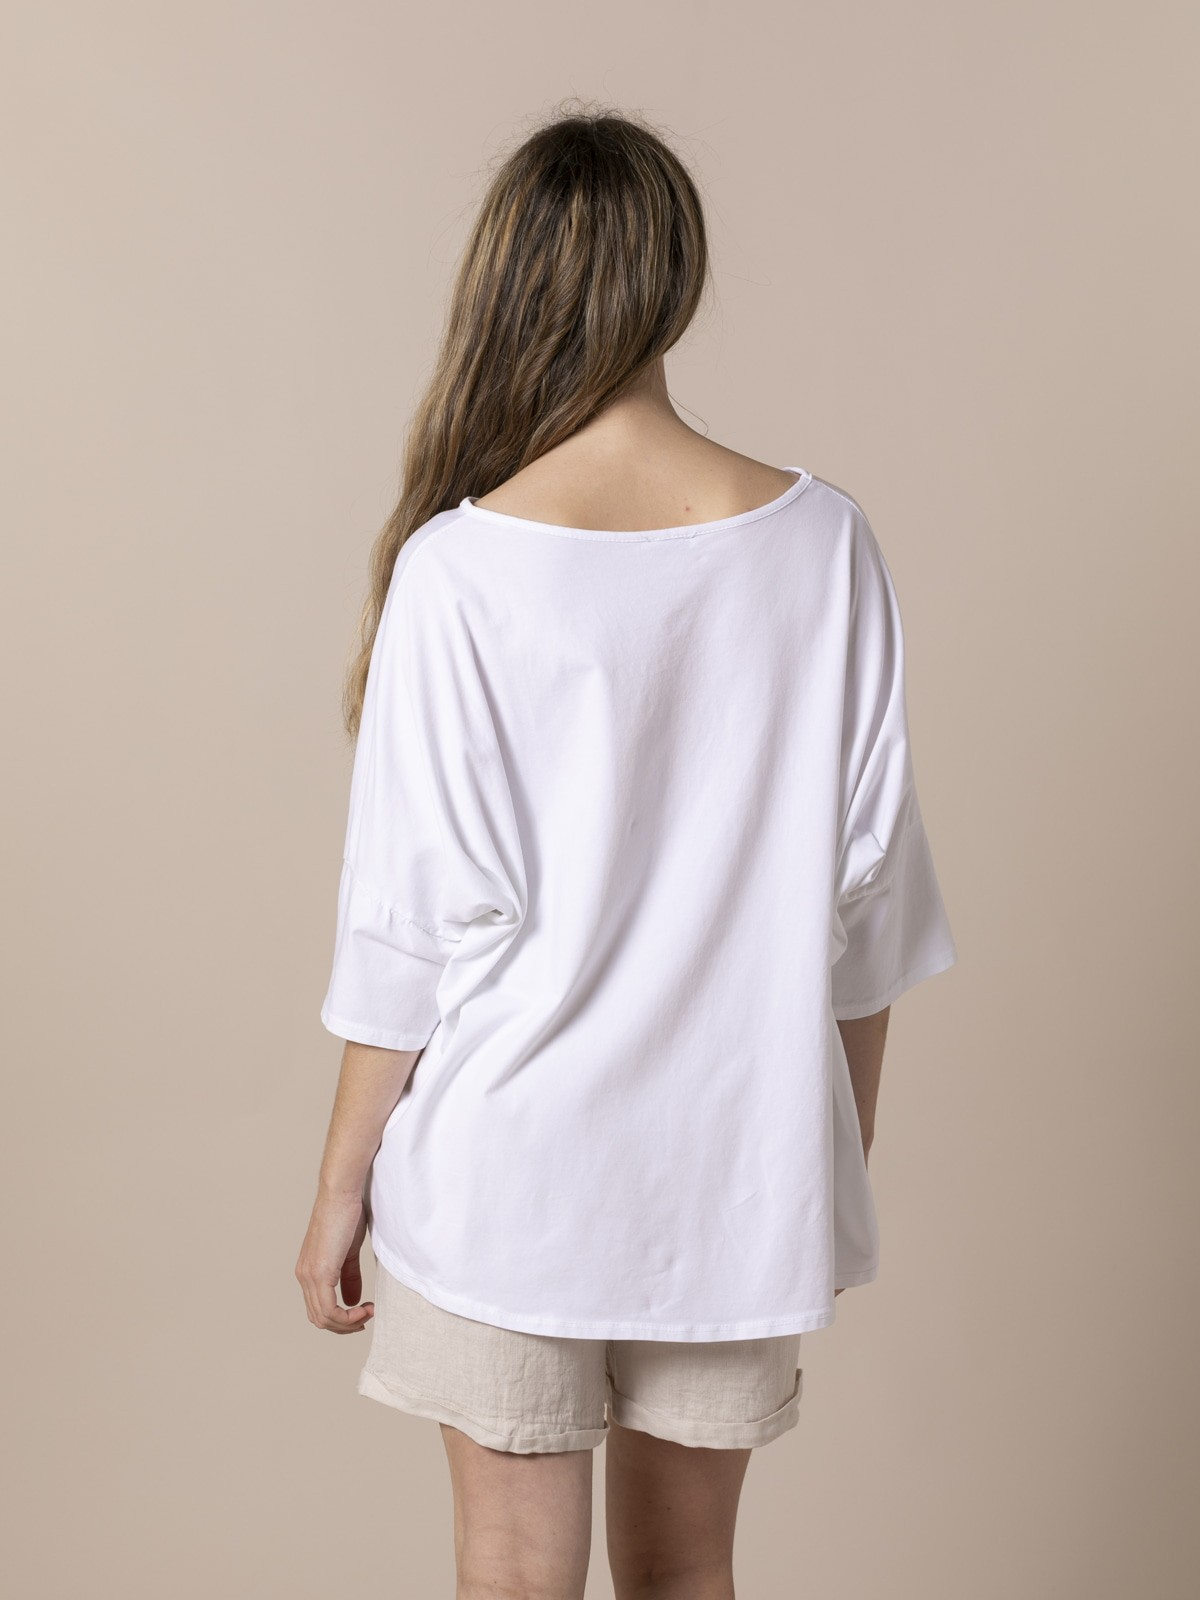 Camiseta oversize mujer cesto flores Beige